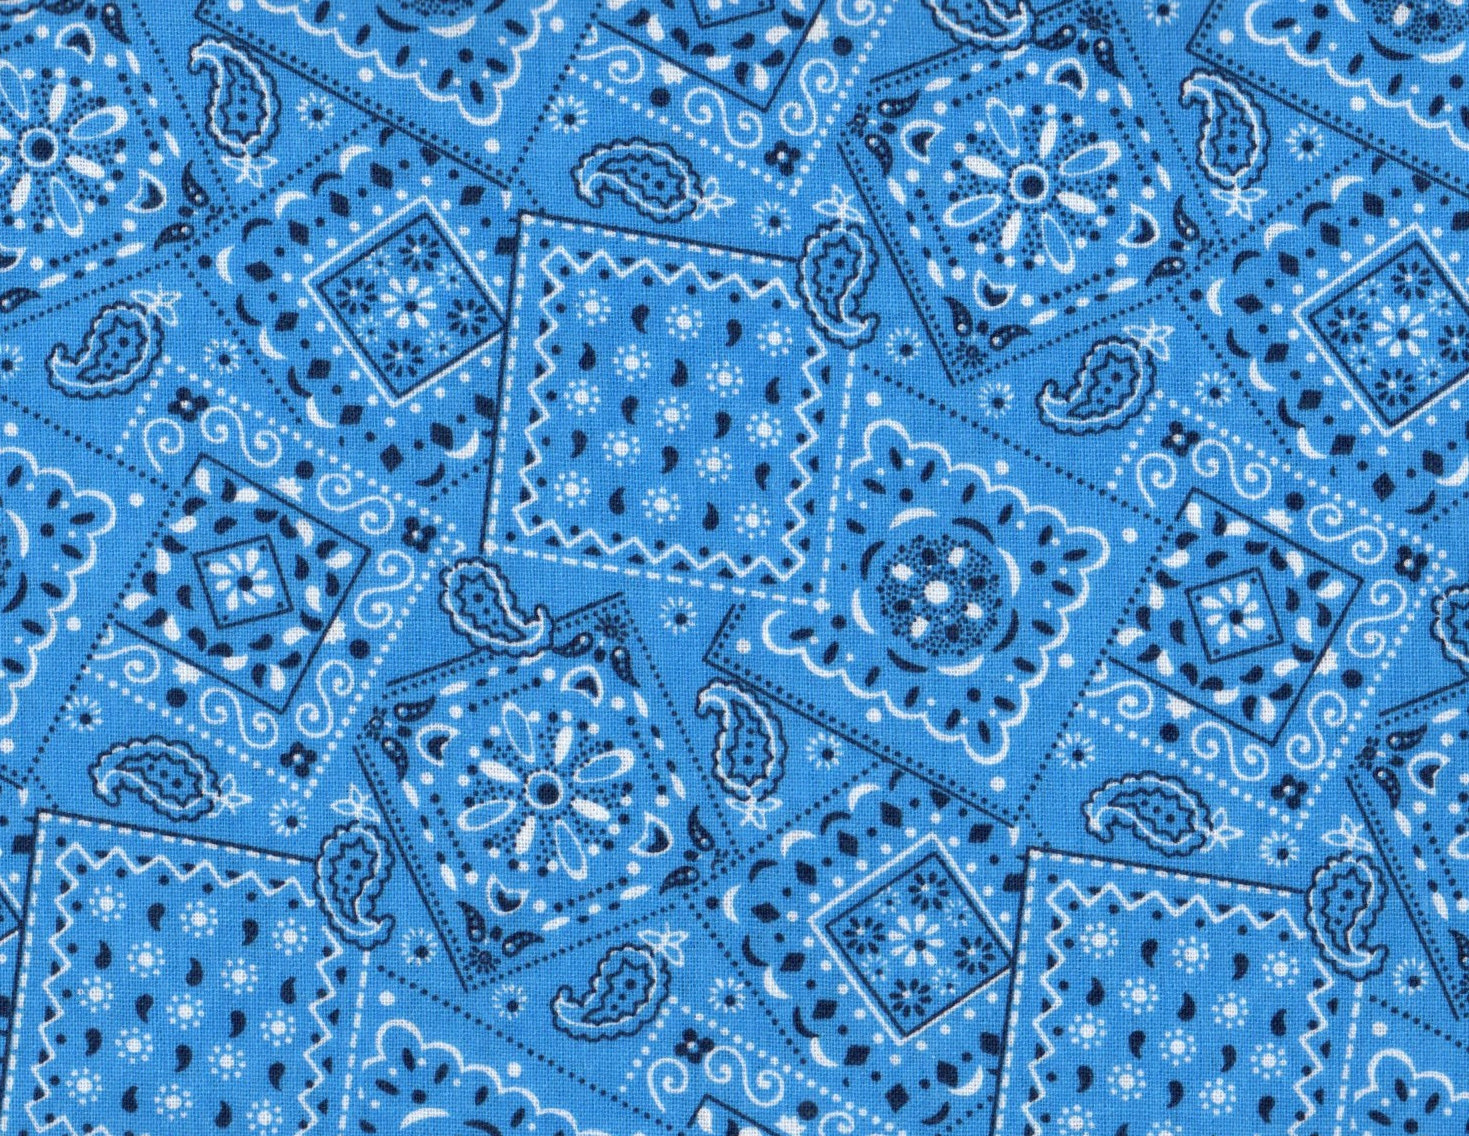 Bandana clipart blue bandana.  collection of background